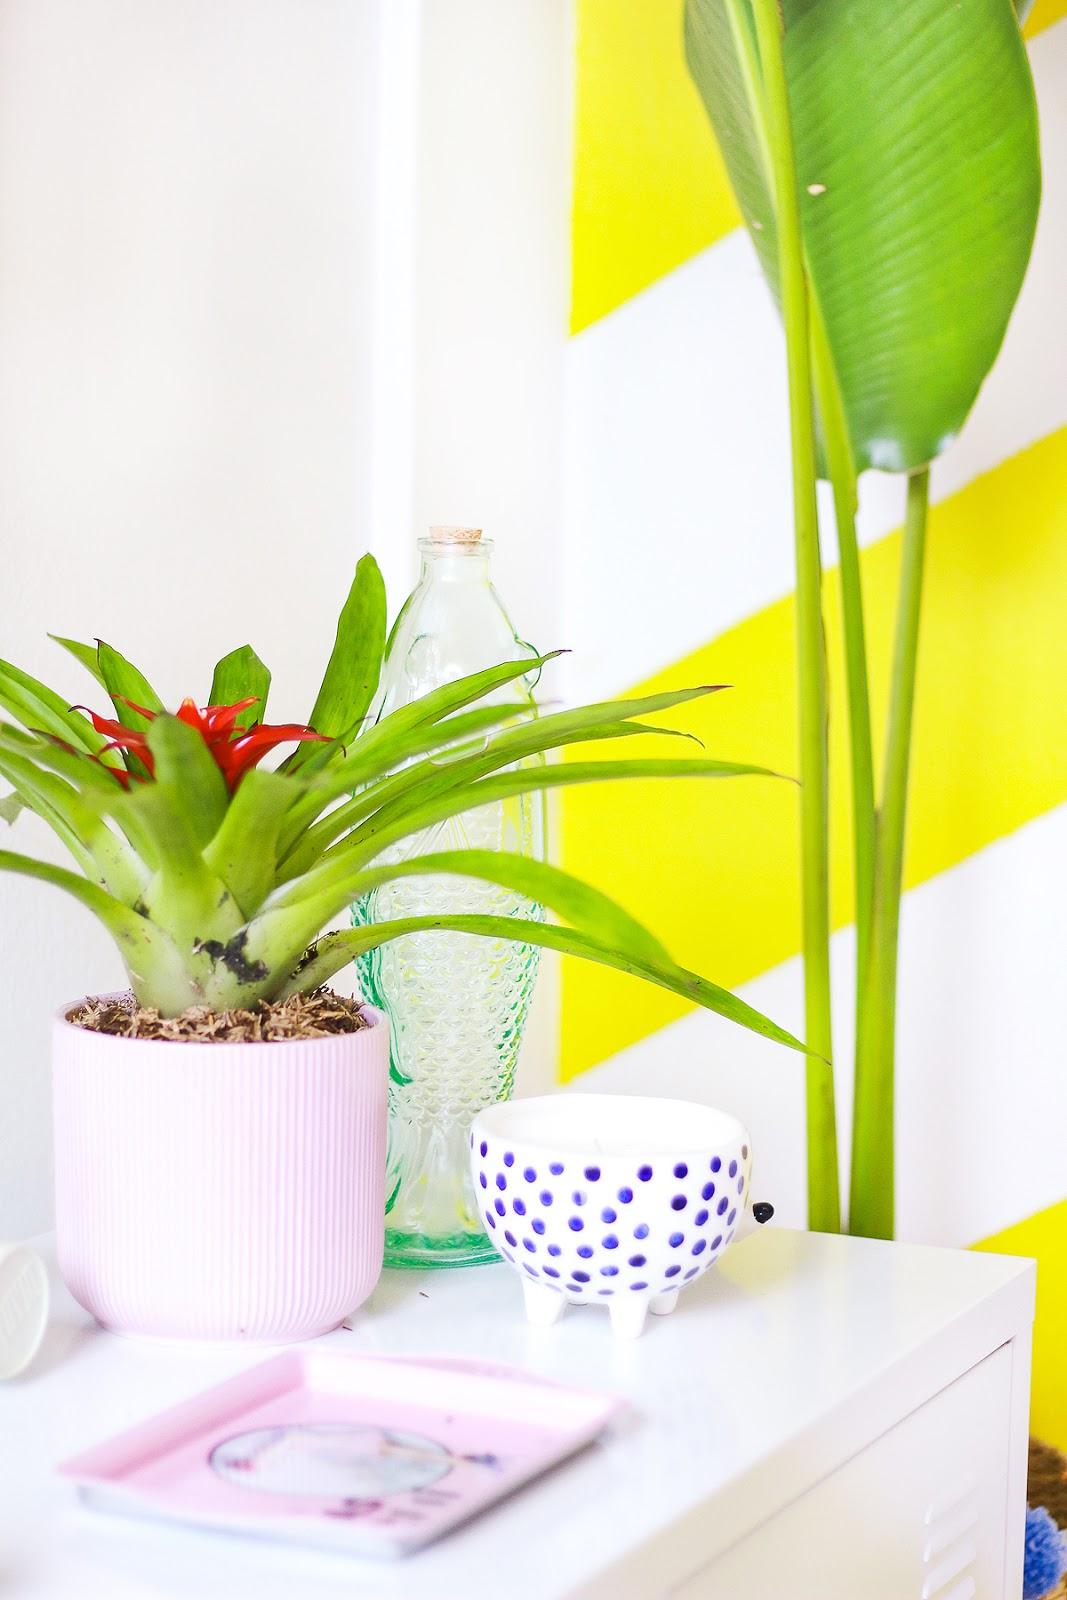 plantas para dentro de casa ravenala bananeira bromelia